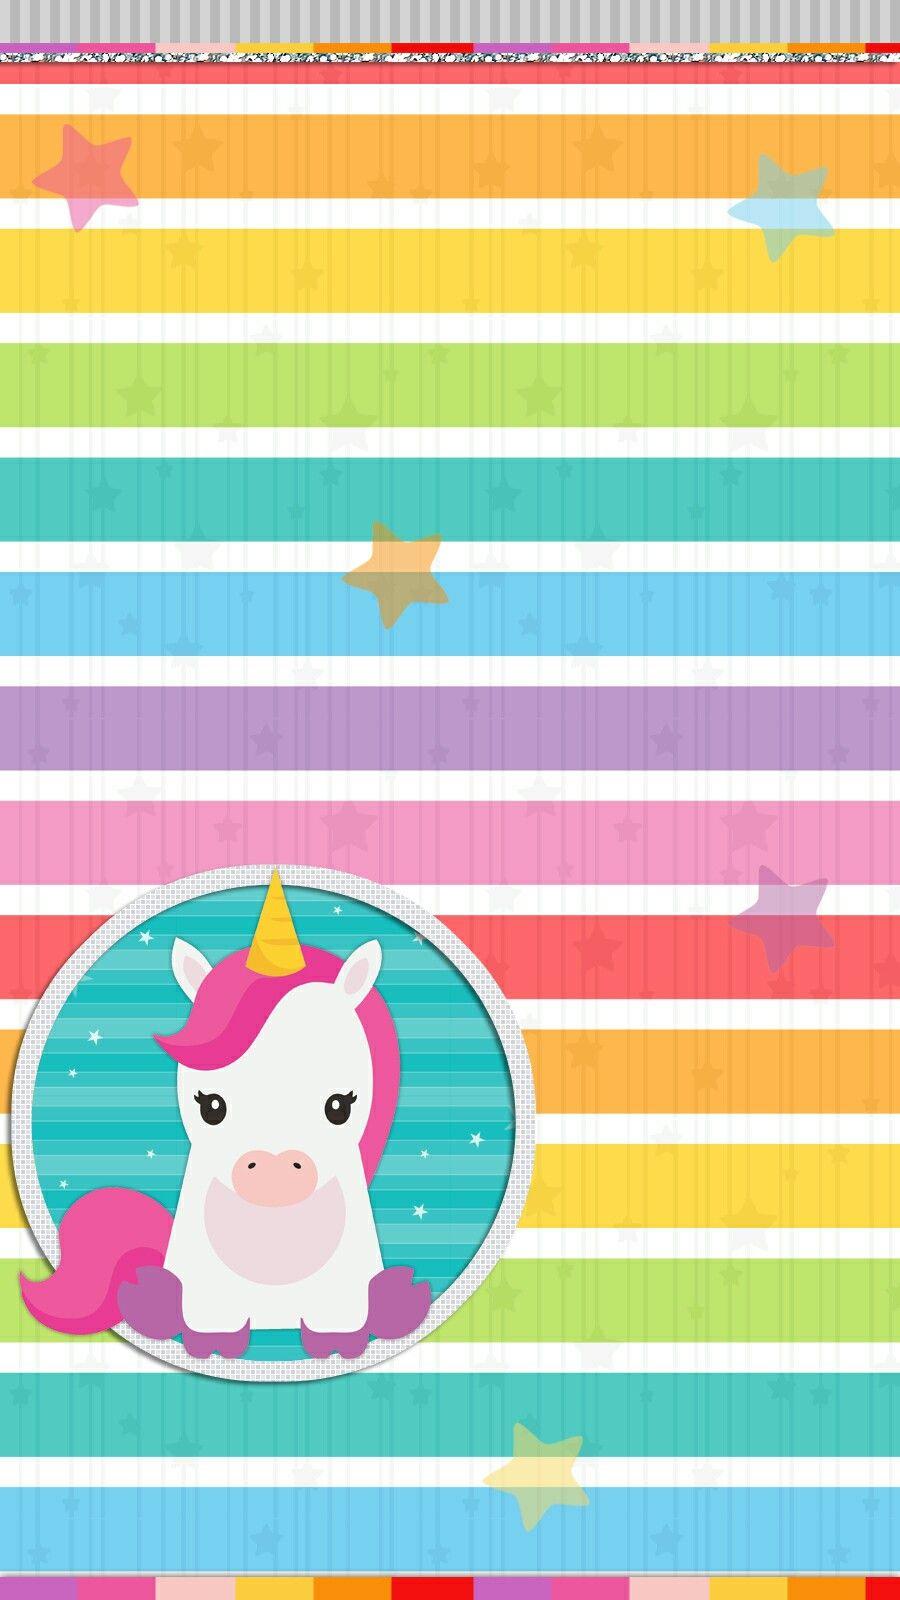 Unicorn Rainbow Wallpaper Iphone Android